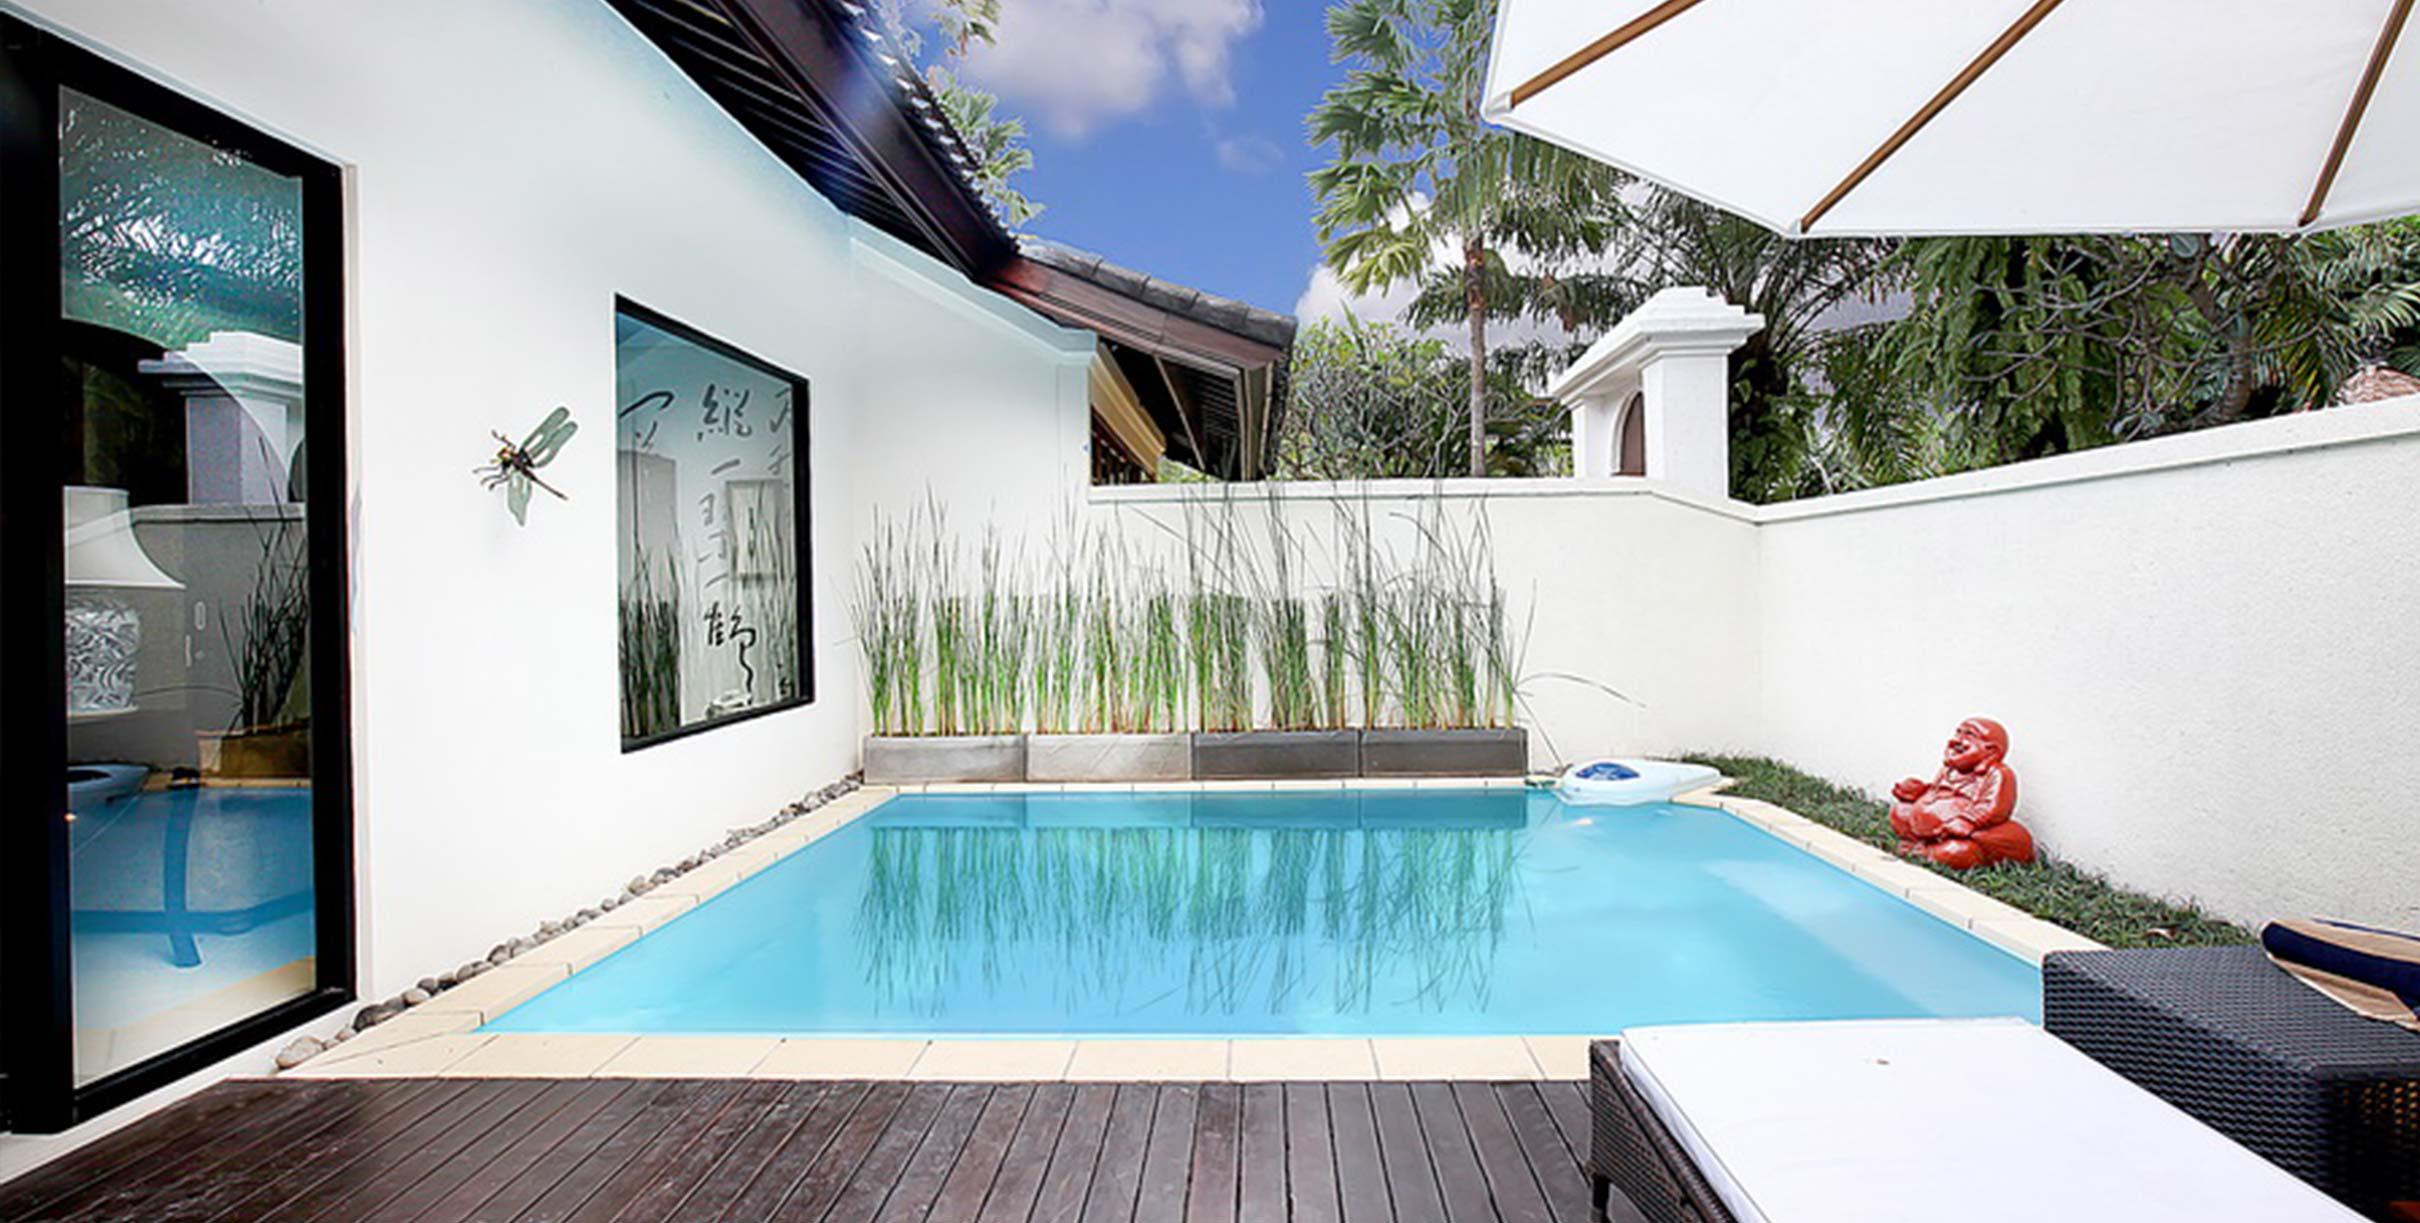 Razkošna vila na Baliju